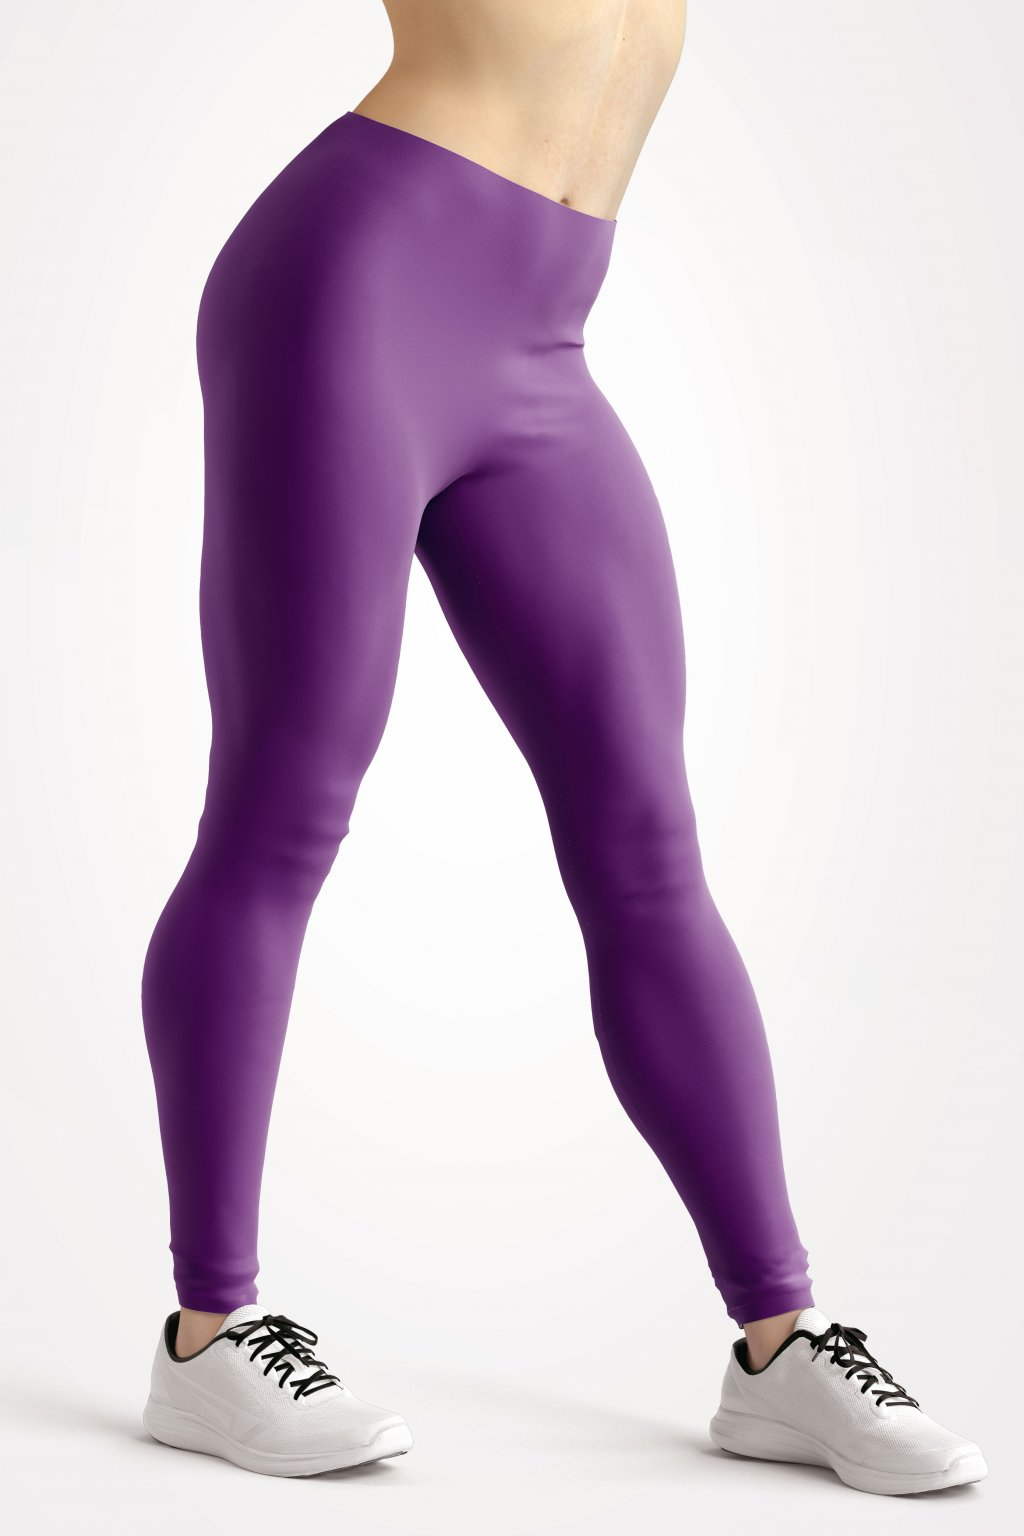 leggings purple essentials front side by utopy